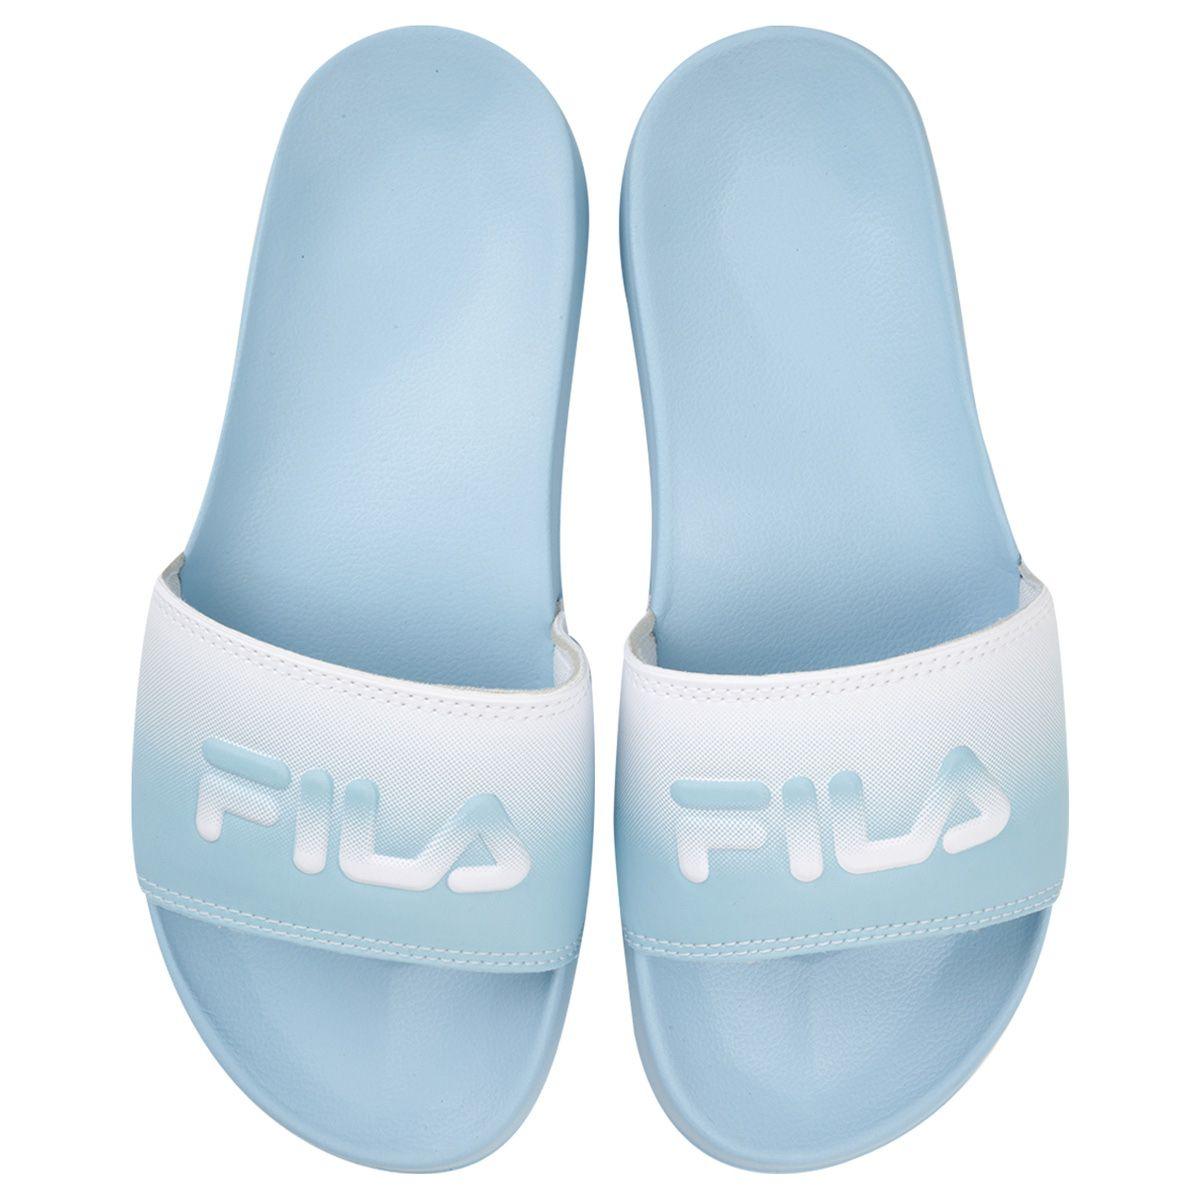 Chinelo Fila Flip Flop Drifter Style Feminino 51A018